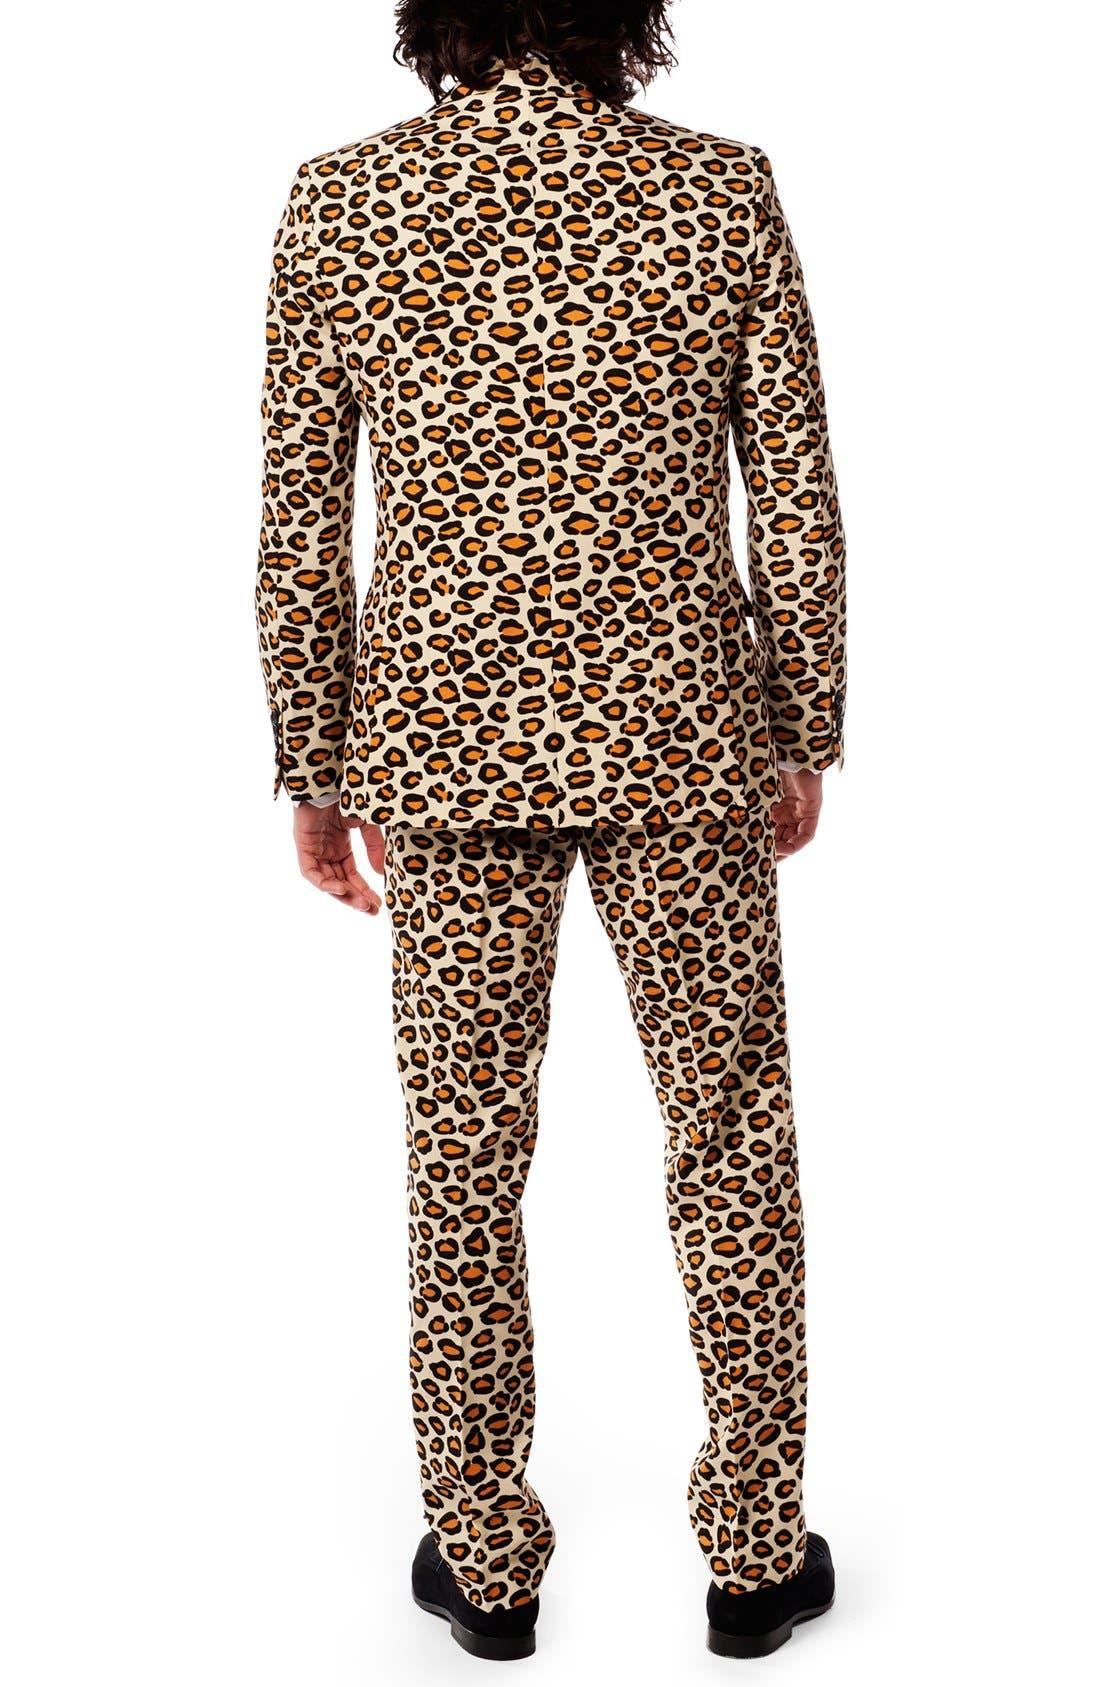 'The Jag' Trim Fit Two-Piece Suit with Tie,                             Alternate thumbnail 2, color,                             251